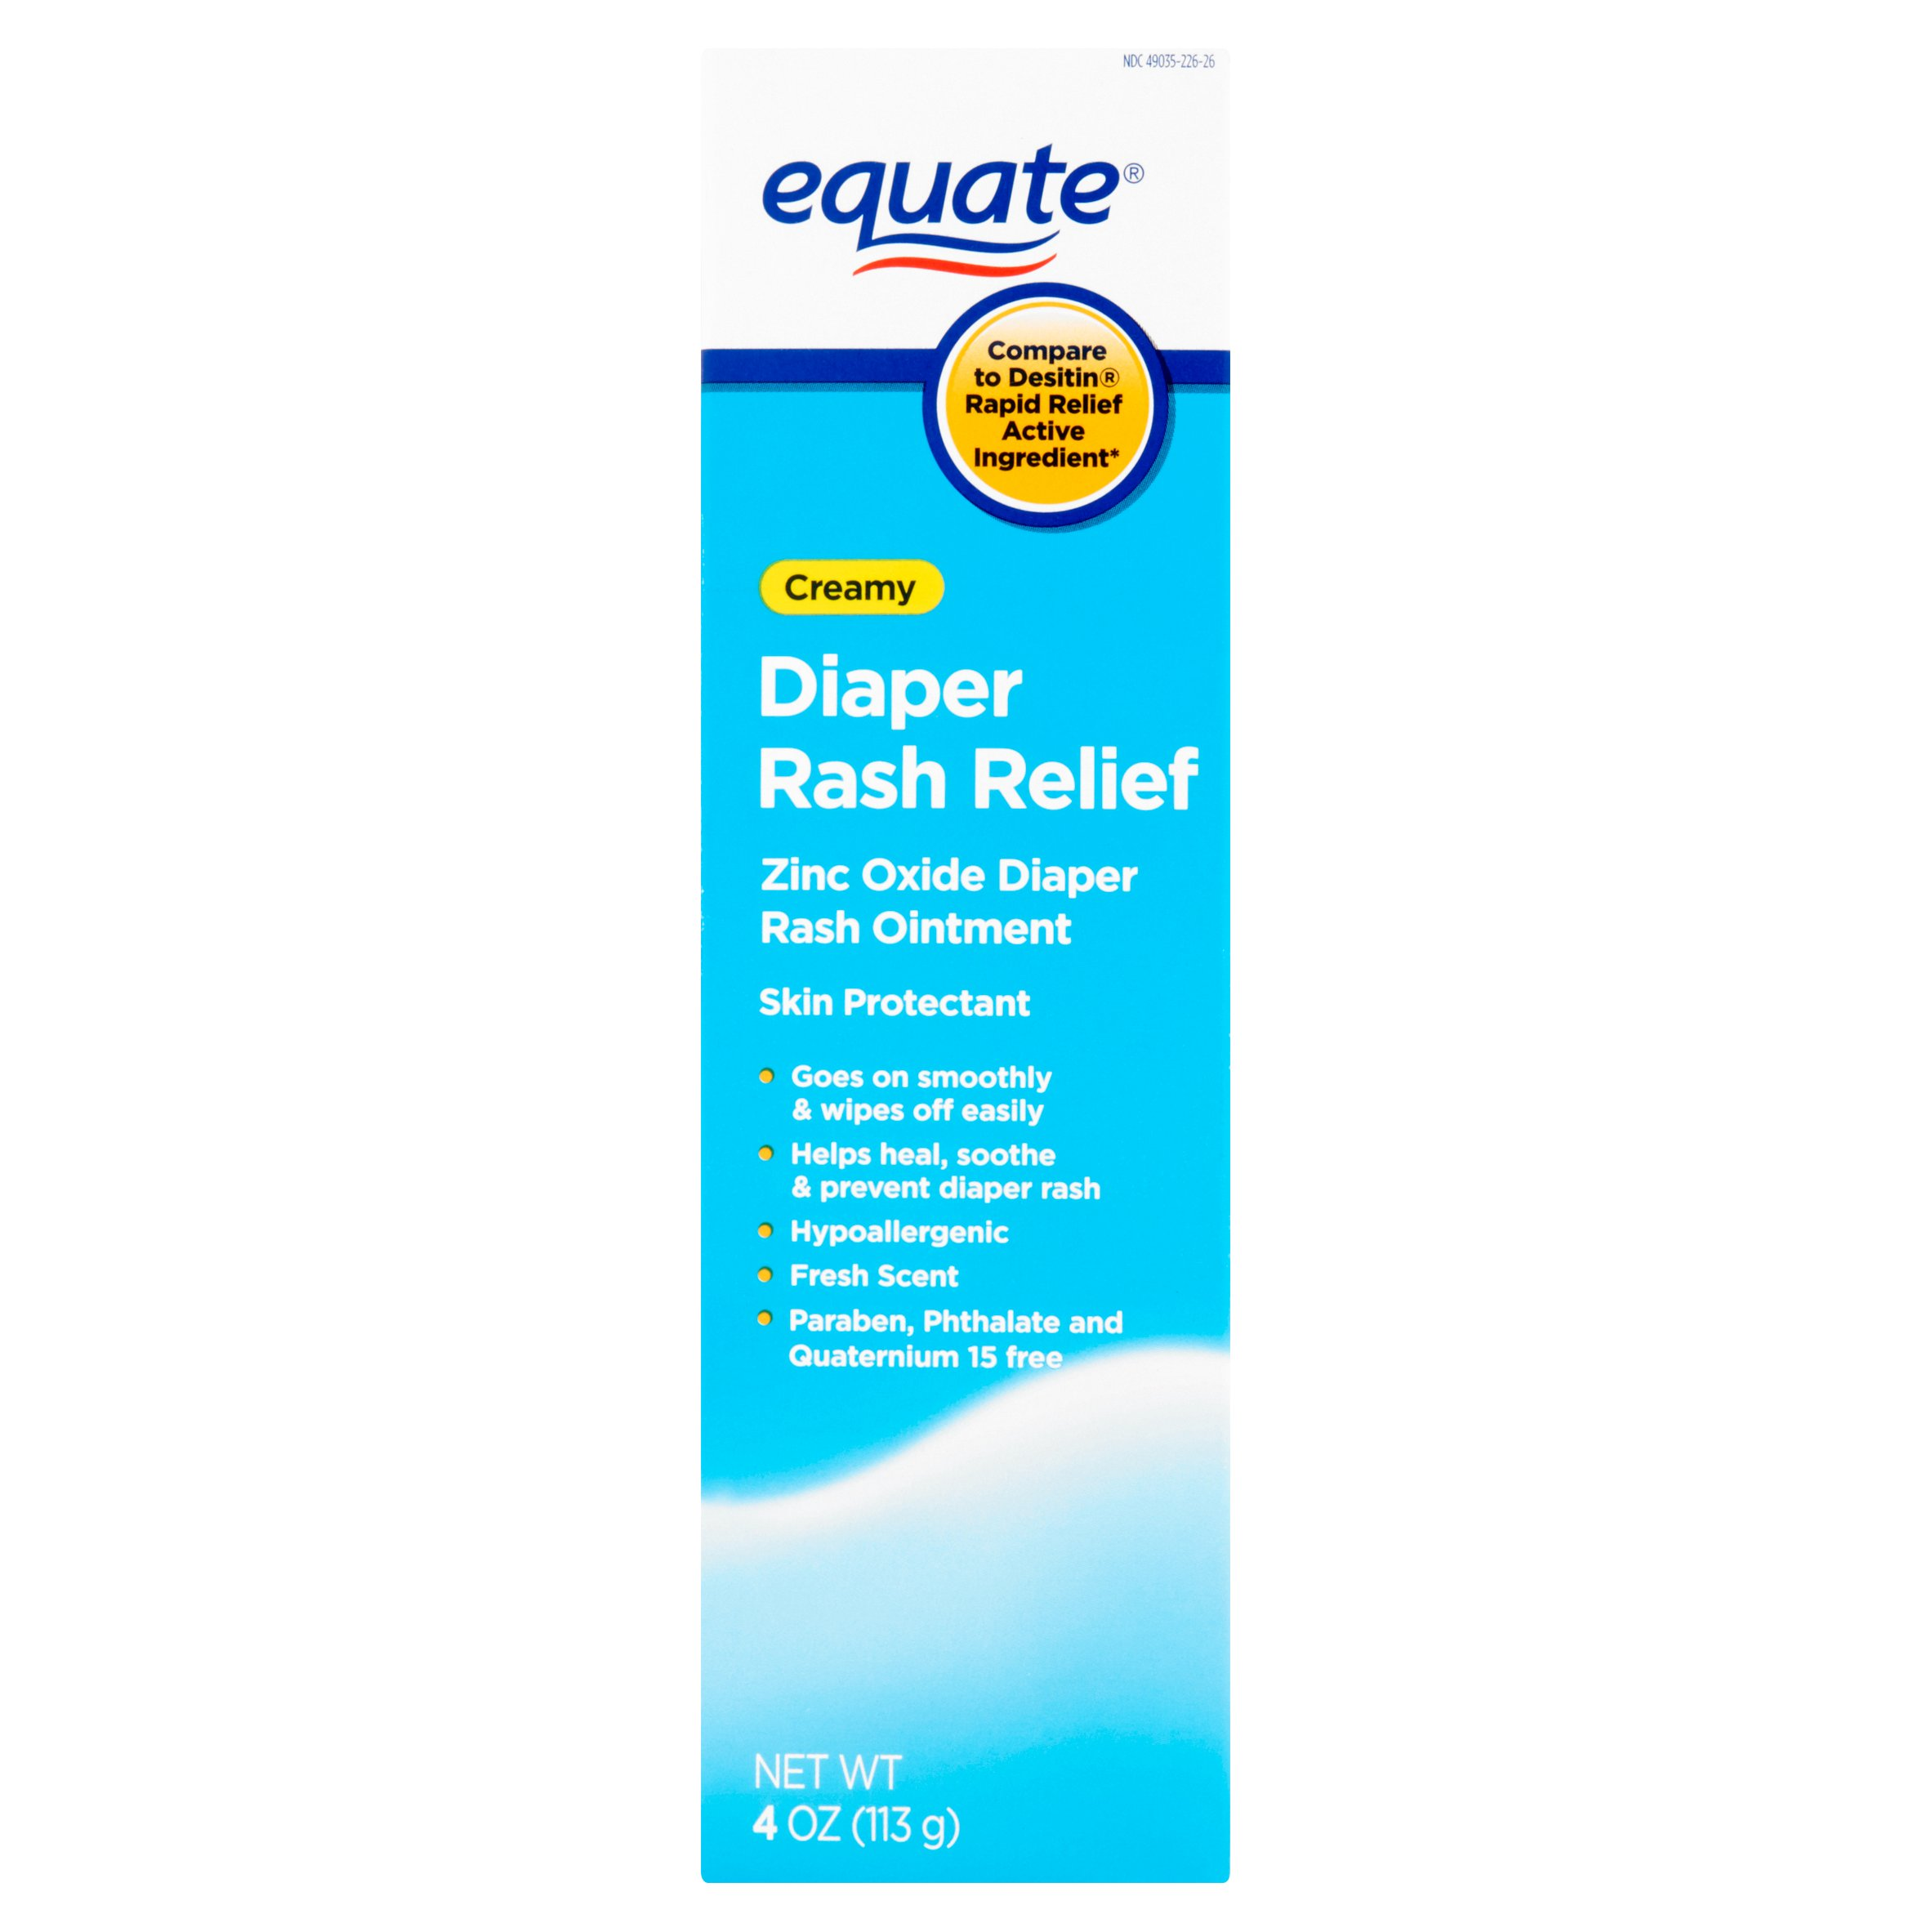 Equate Creamy Diaper Rash Relief Rash Ointment, 4 Oz